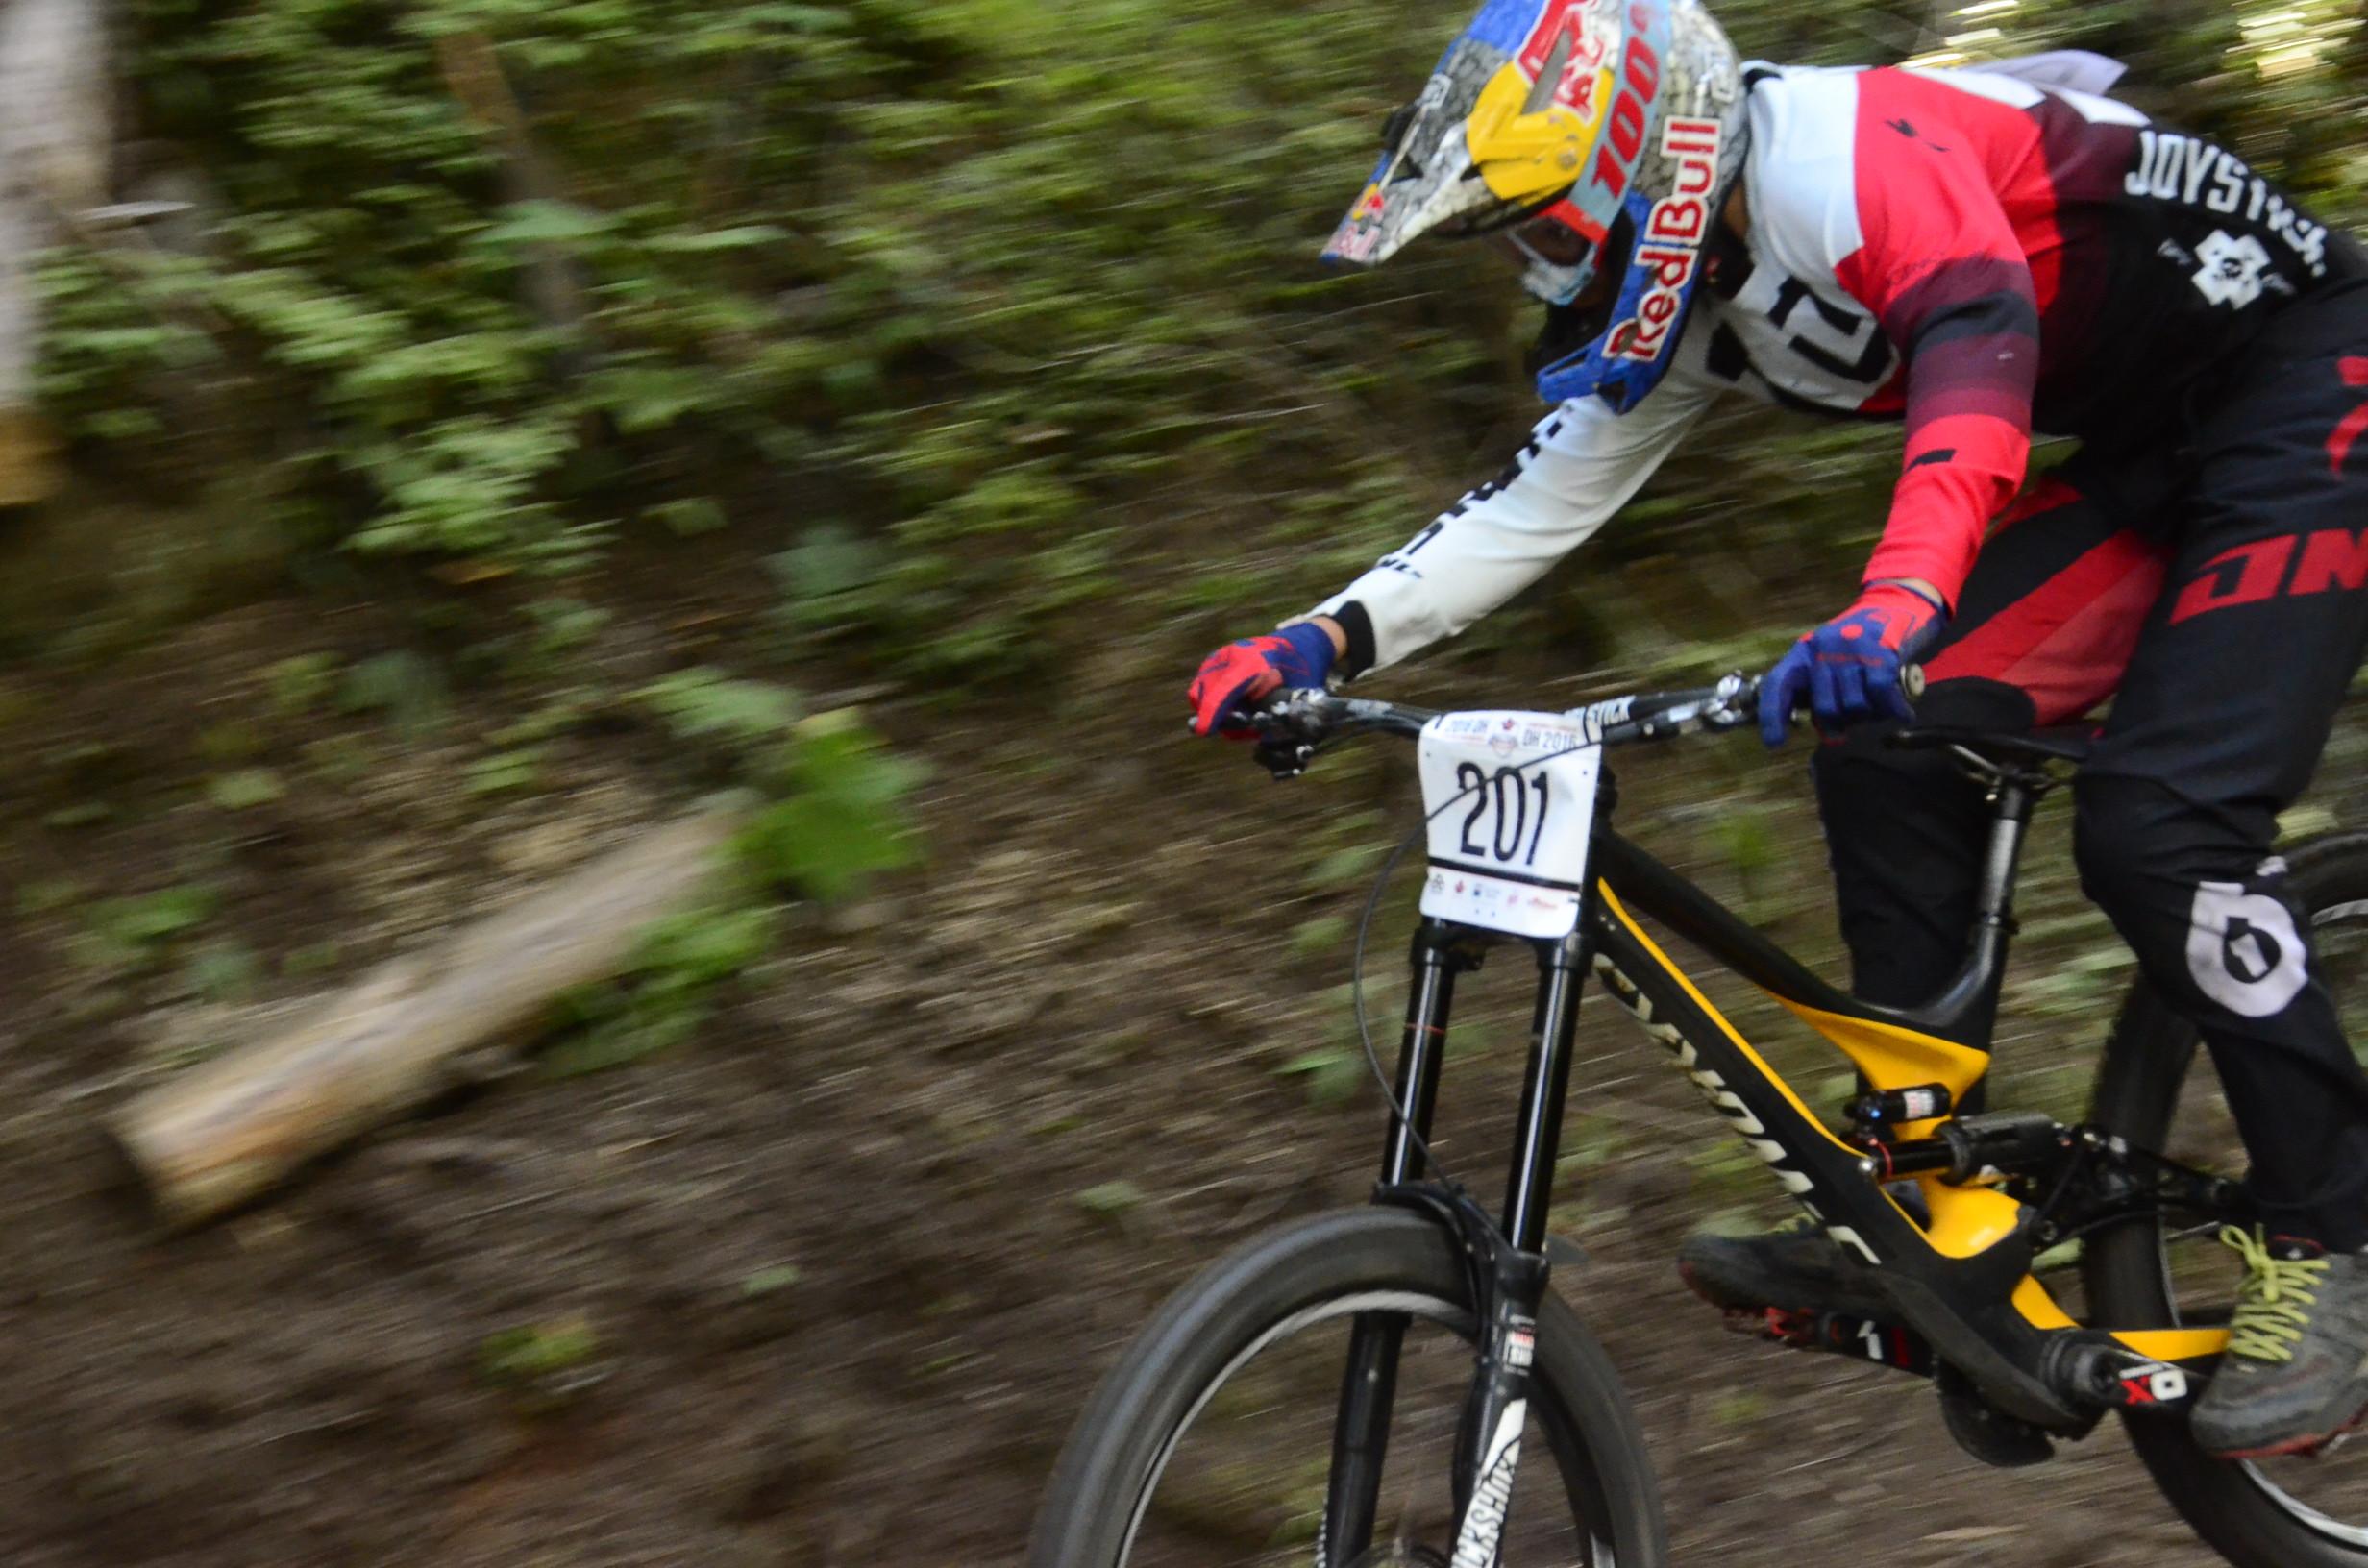 Finn Iles flies down the course en route to capturing the Junior Expert Men's title. - Photo Jamie Shinkewski